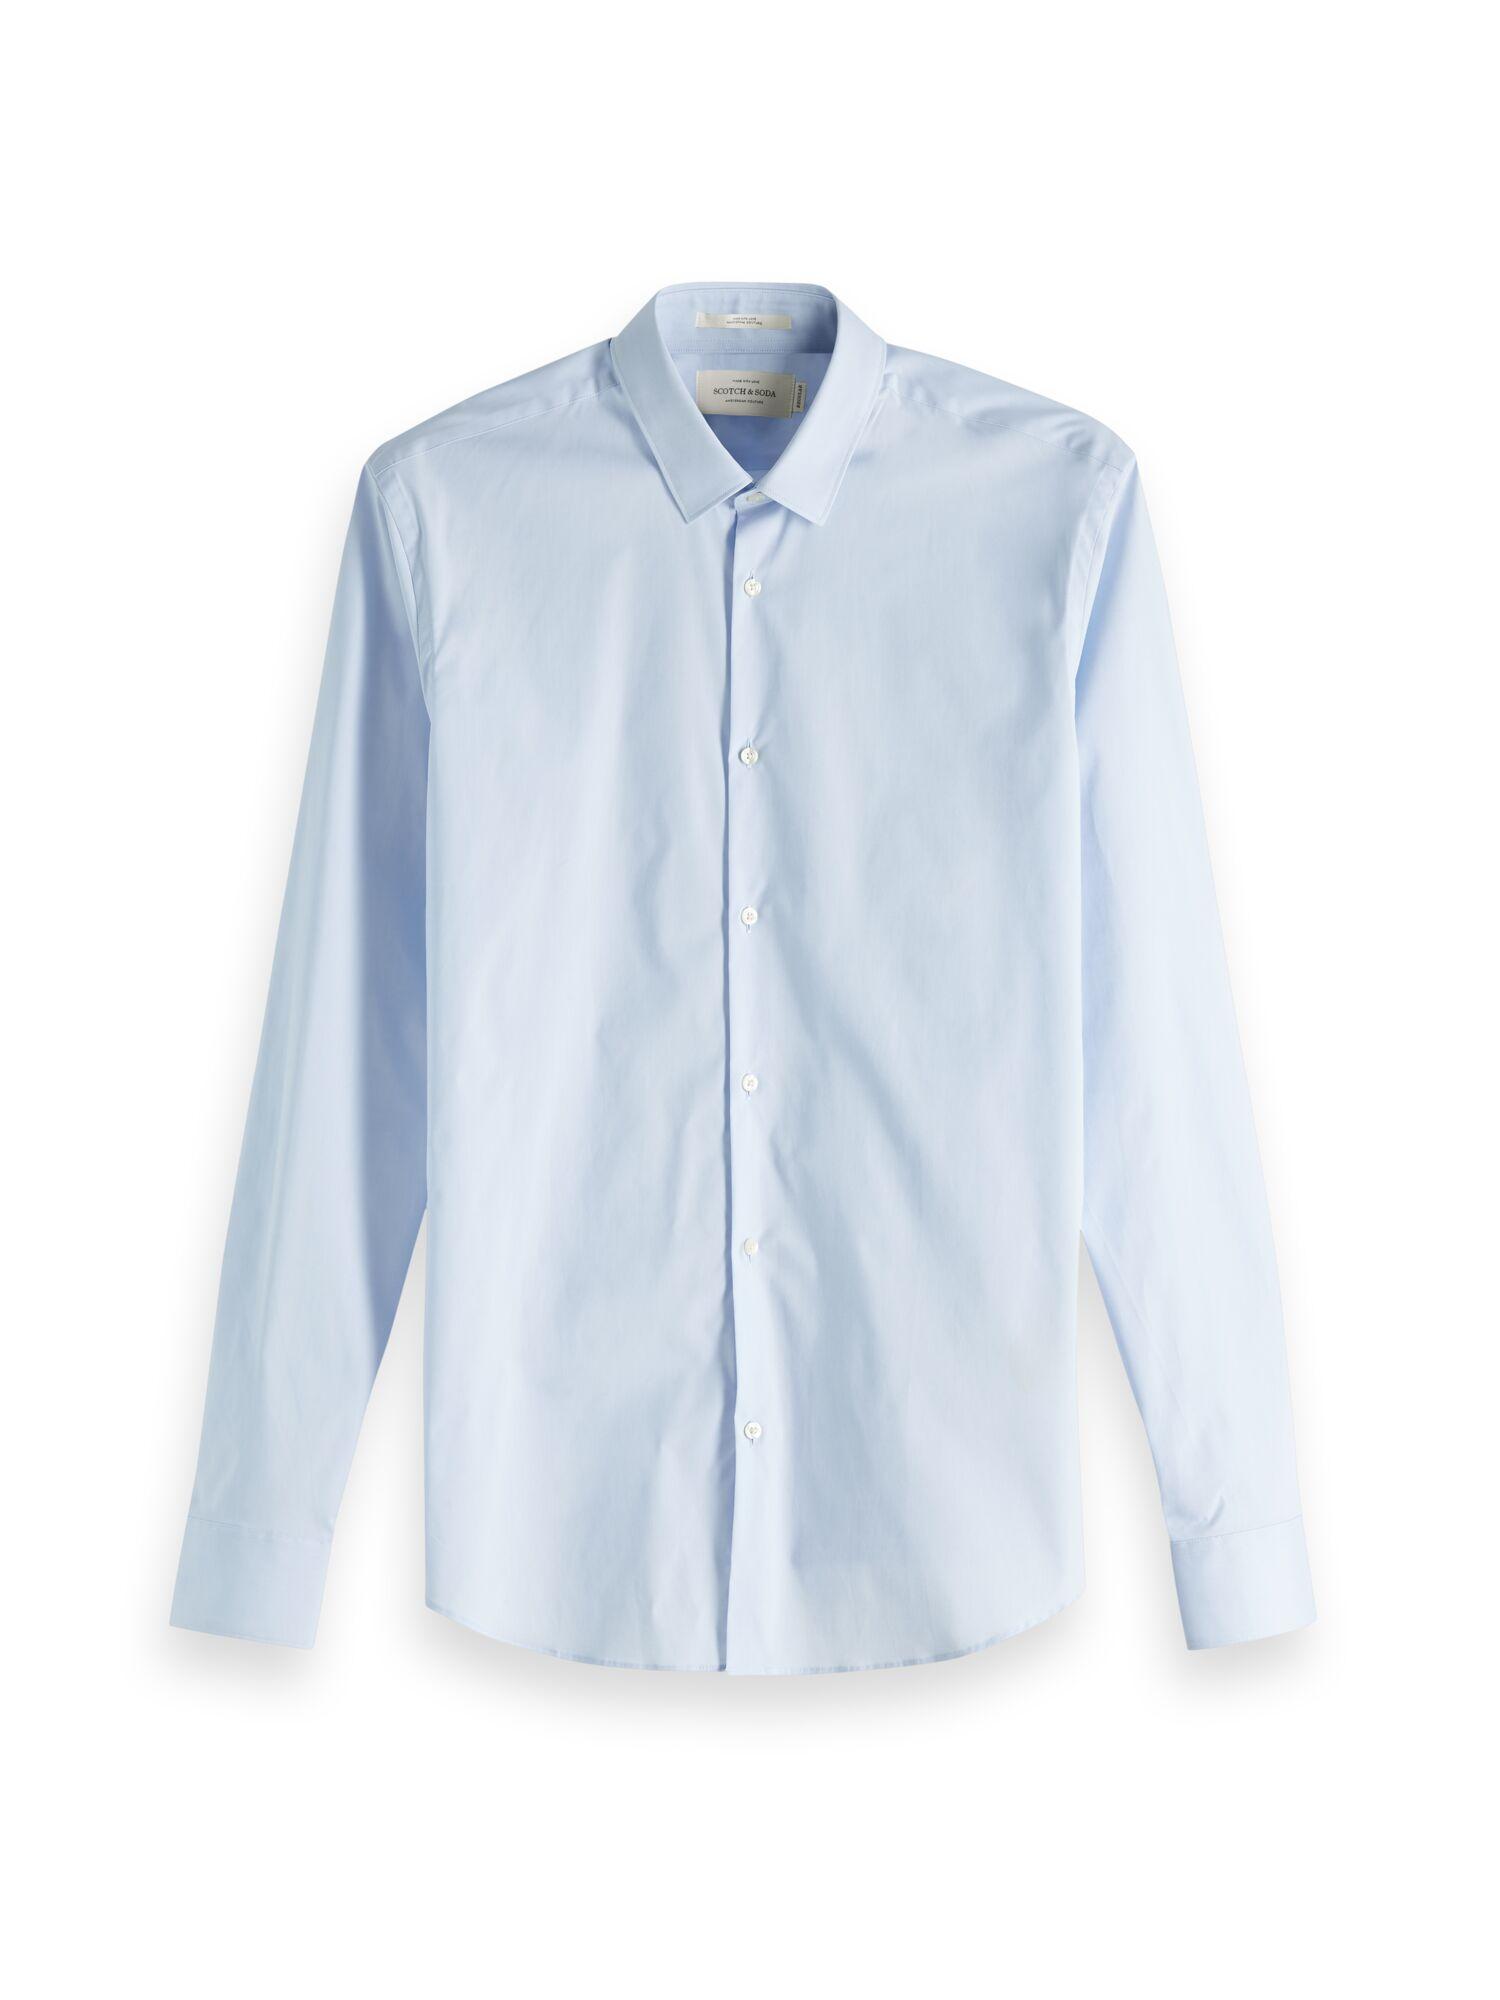 Scotch & Soda | Essentials - Classic elastane shirt slim fit classic collar